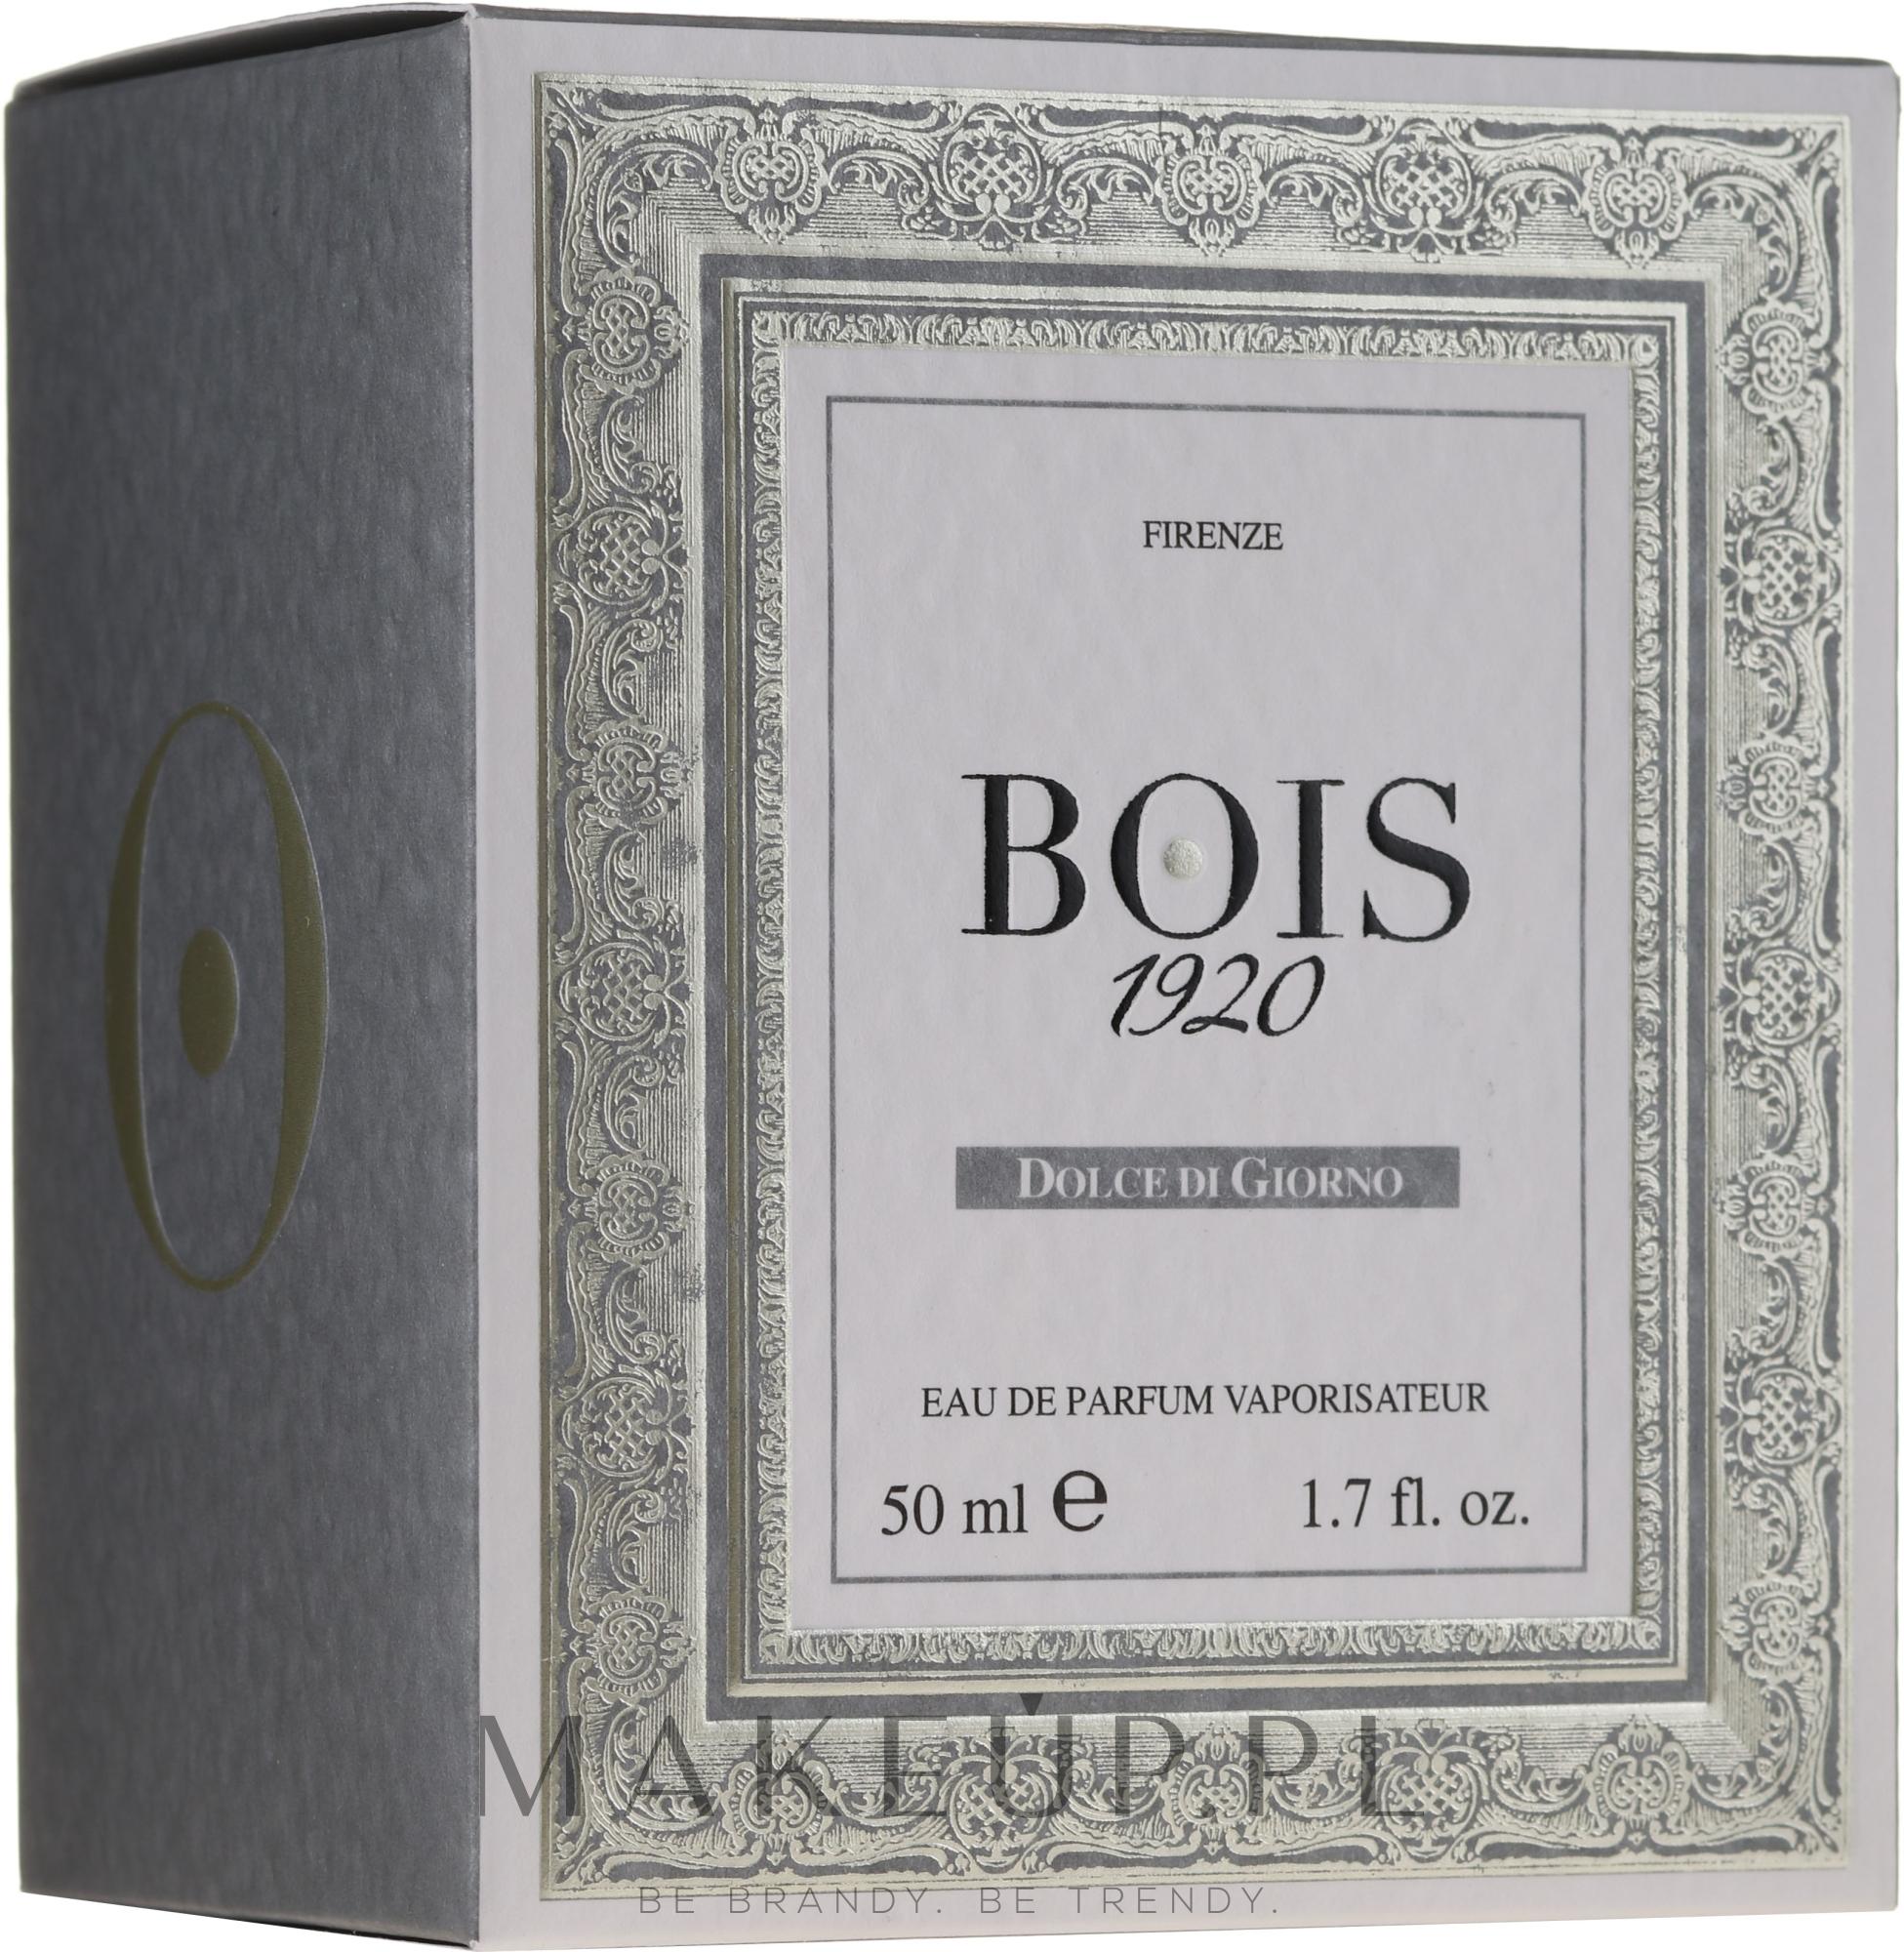 Bois 1920 Dolce di Giorno Limited Art Collection - Woda perfumowana — фото 50 ml